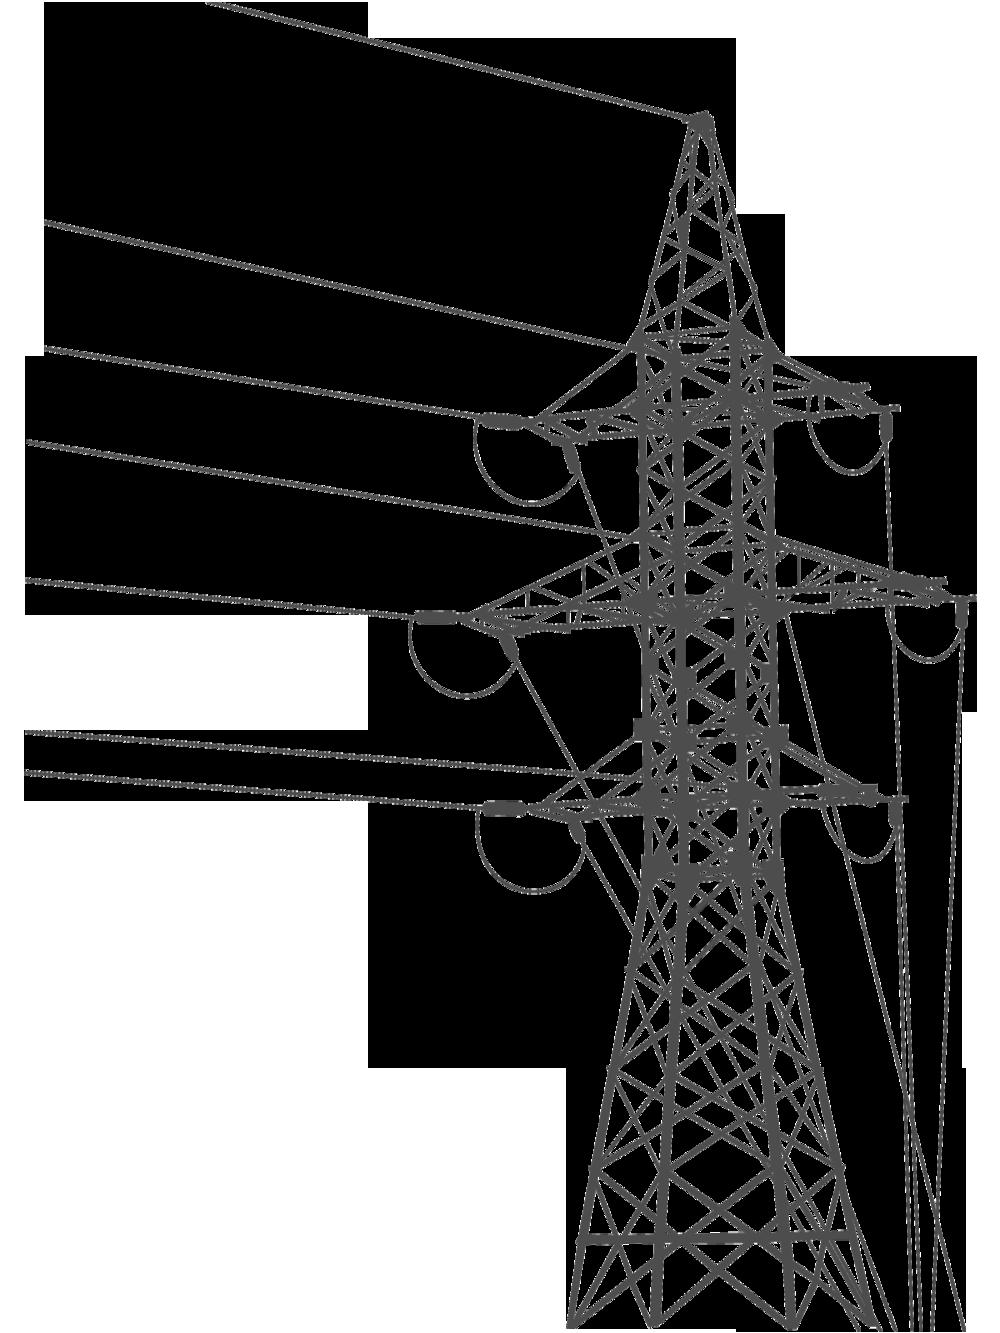 1000x1333 Pembinaan Teras Maju Power Is Our Business